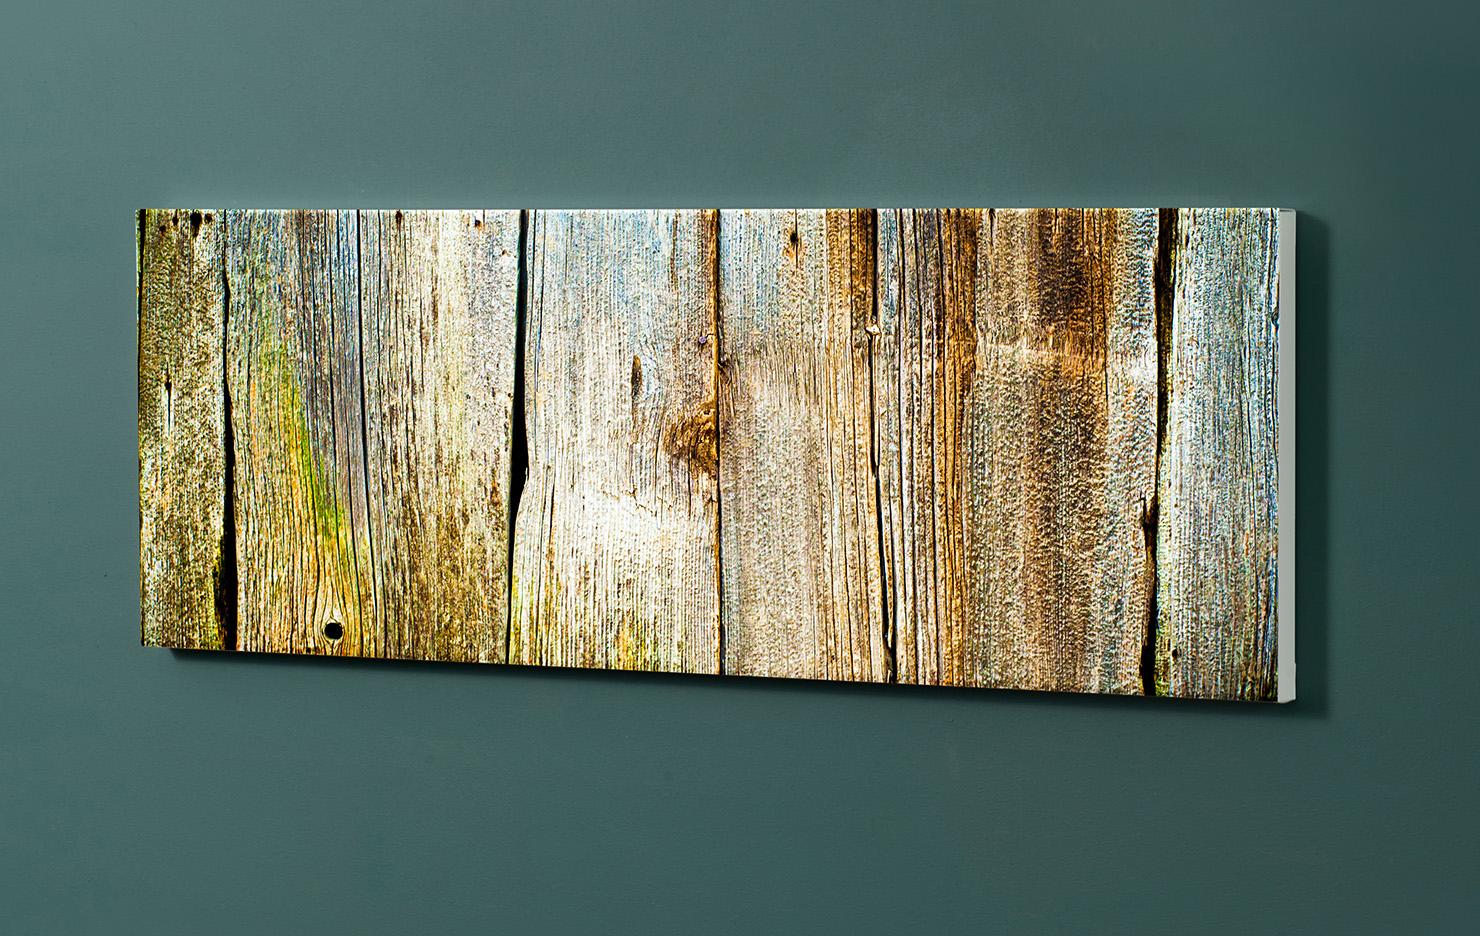 Magnettafel NOTIZ 90x30cm Motiv-Pinnwand M14 Holzbretter Vintage